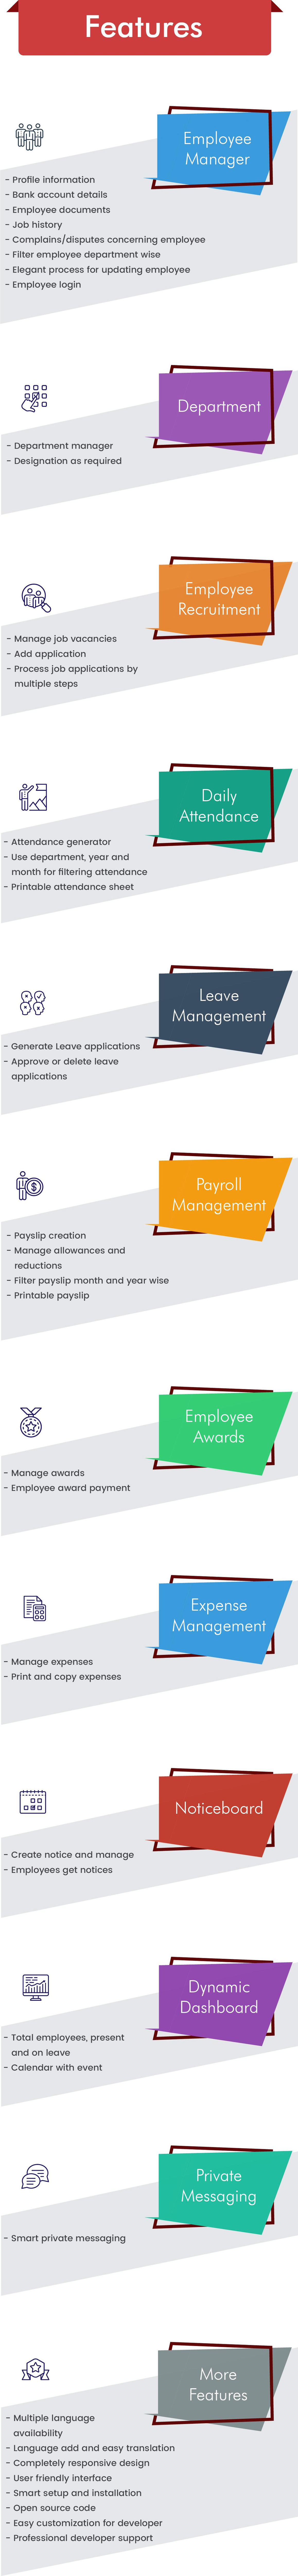 ... Human Resource & Payroll Management System - 4